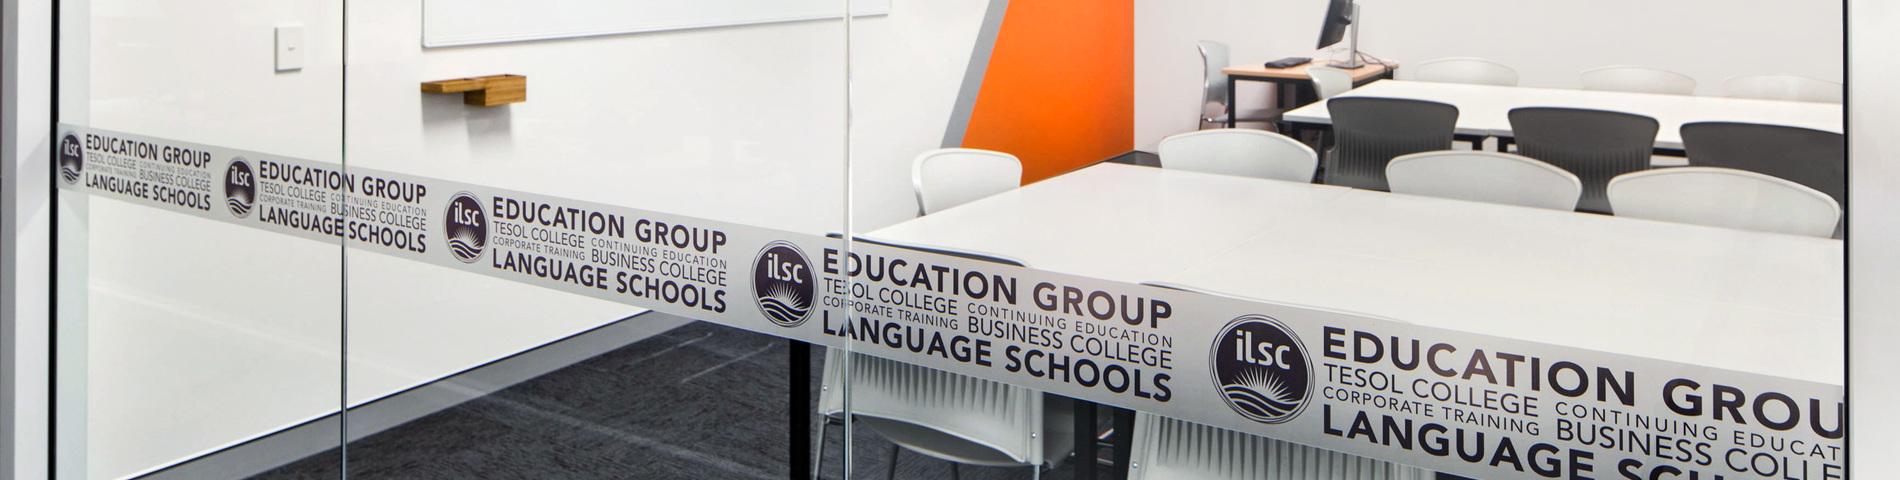 ILSC Language School picture 1